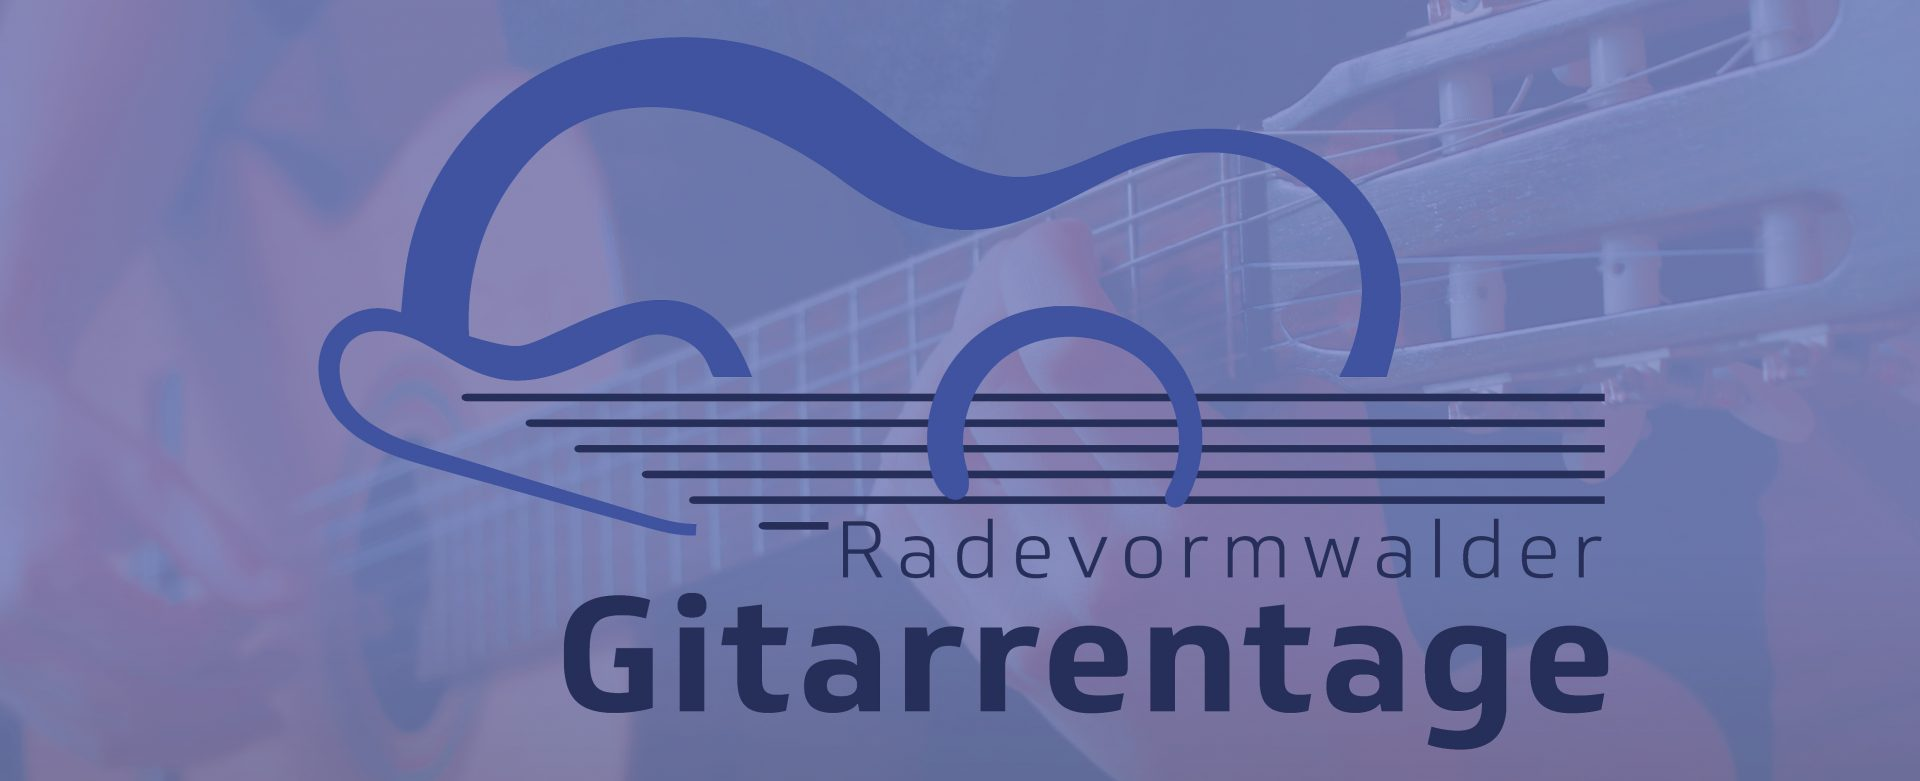 Radevormwalder Gitarrentage 2019